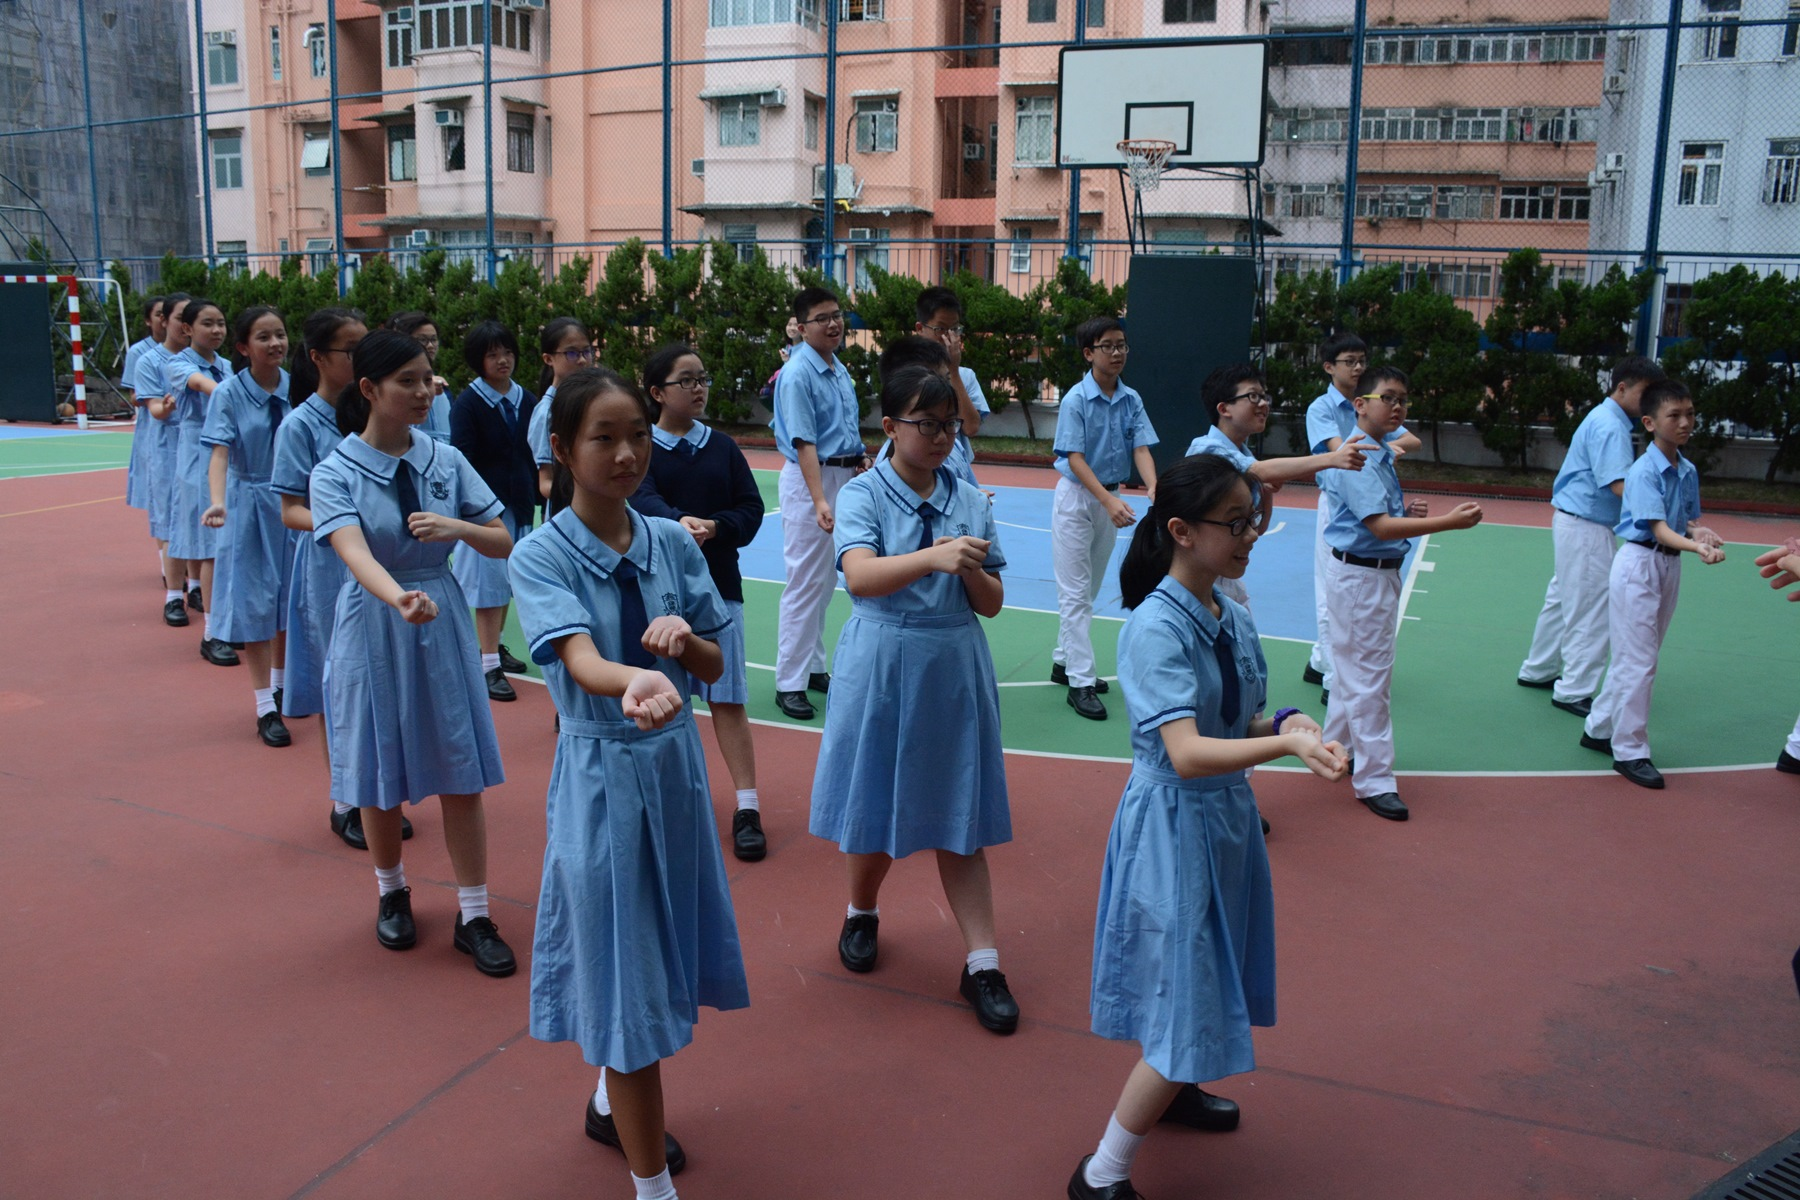 http://npc.edu.hk/sites/default/files/dsc_5553.jpg